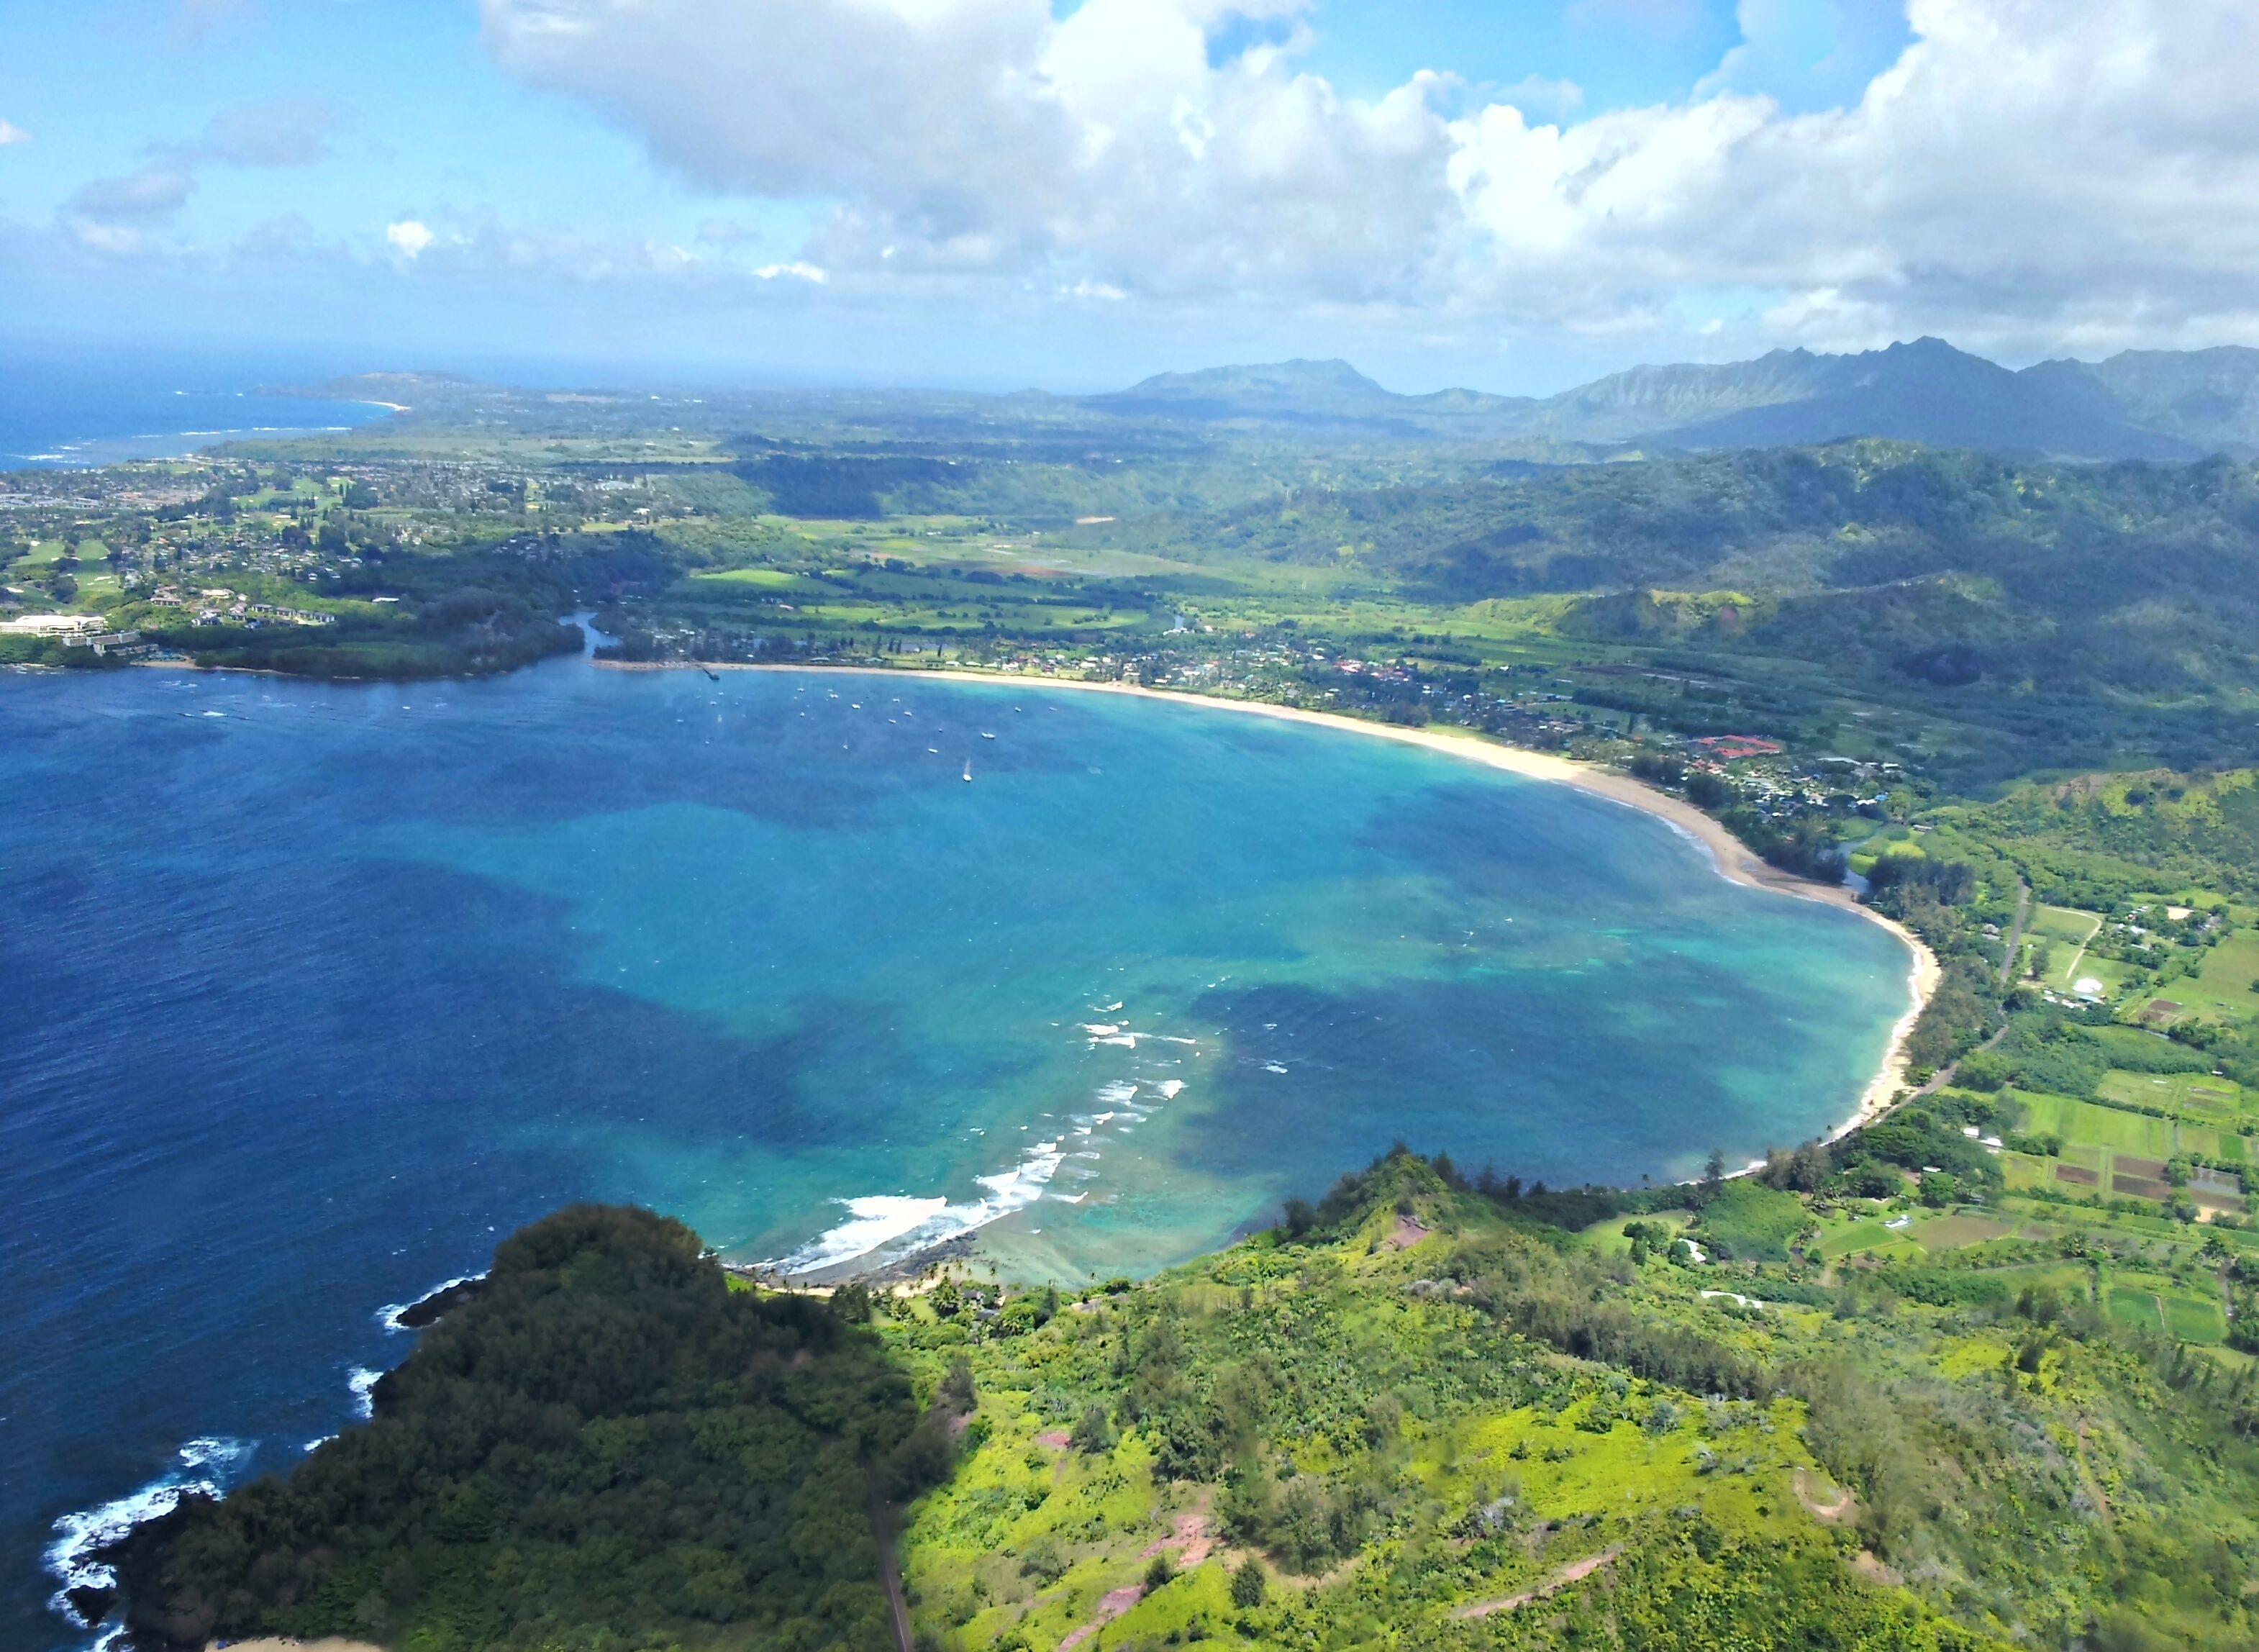 Hanalei Bay Kauai Hawaii Like Us To Start Each Day With A Photo